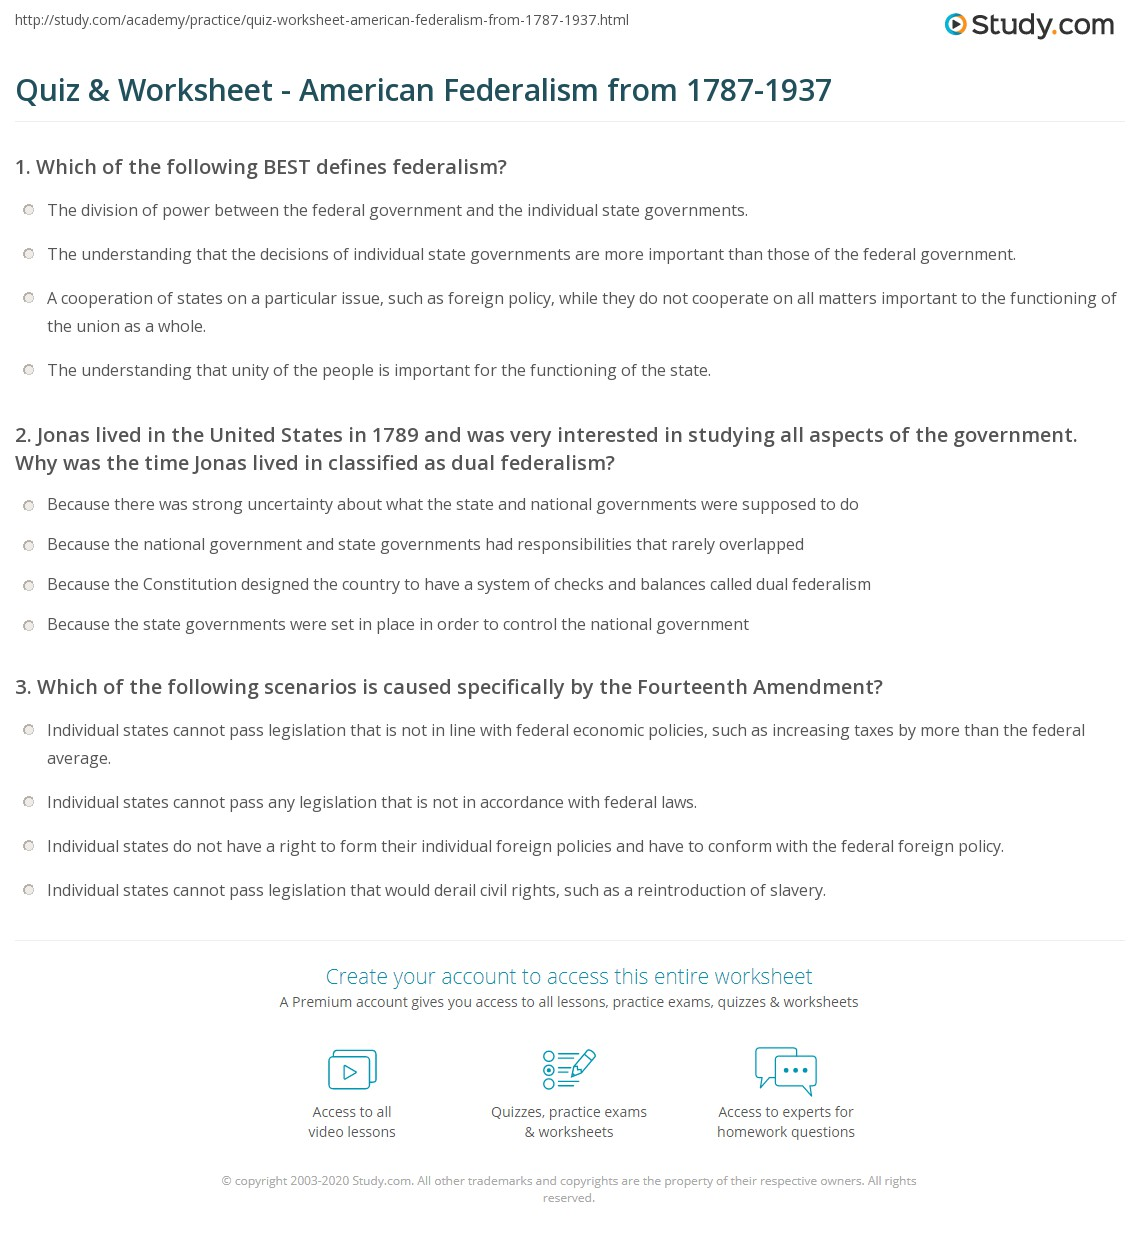 Quiz & Worksheet - American Federalism from 1787-1937   Study.com